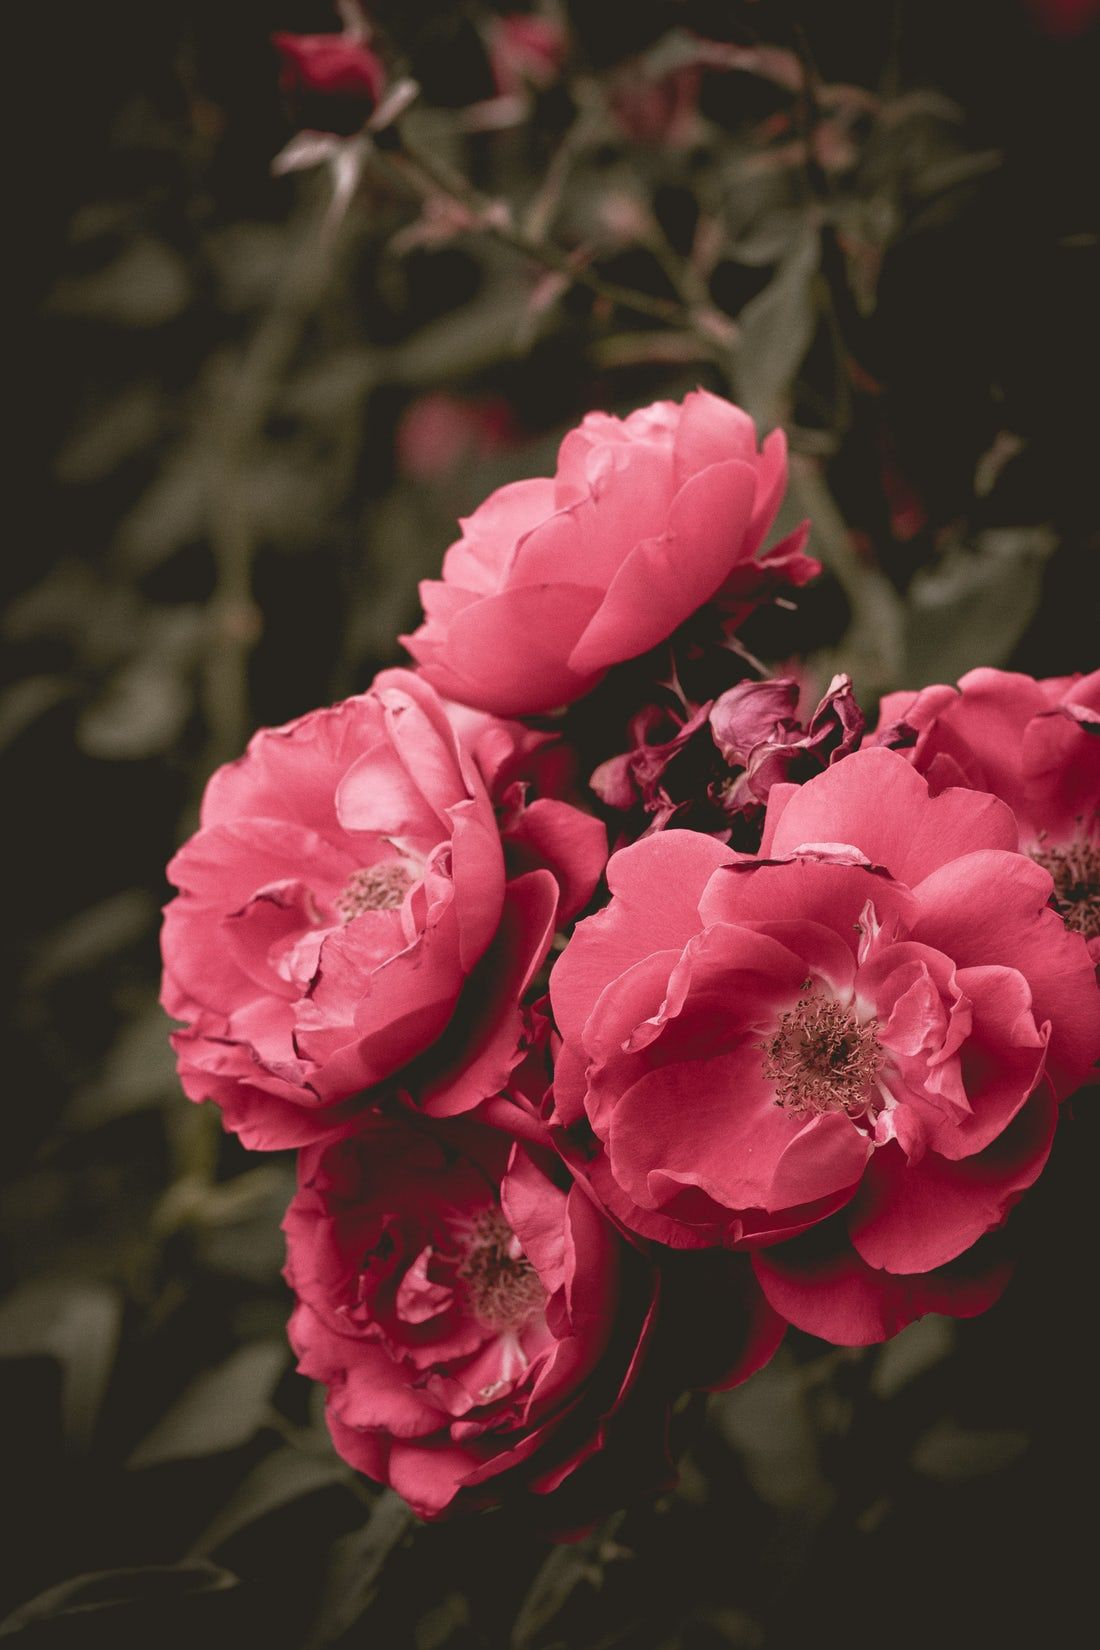 Focus Photography Of Pink Petaled Flowers Hd Flower Wallpaper Orange Flower Photos Flowers Photography Coolest flower wallpapers hd